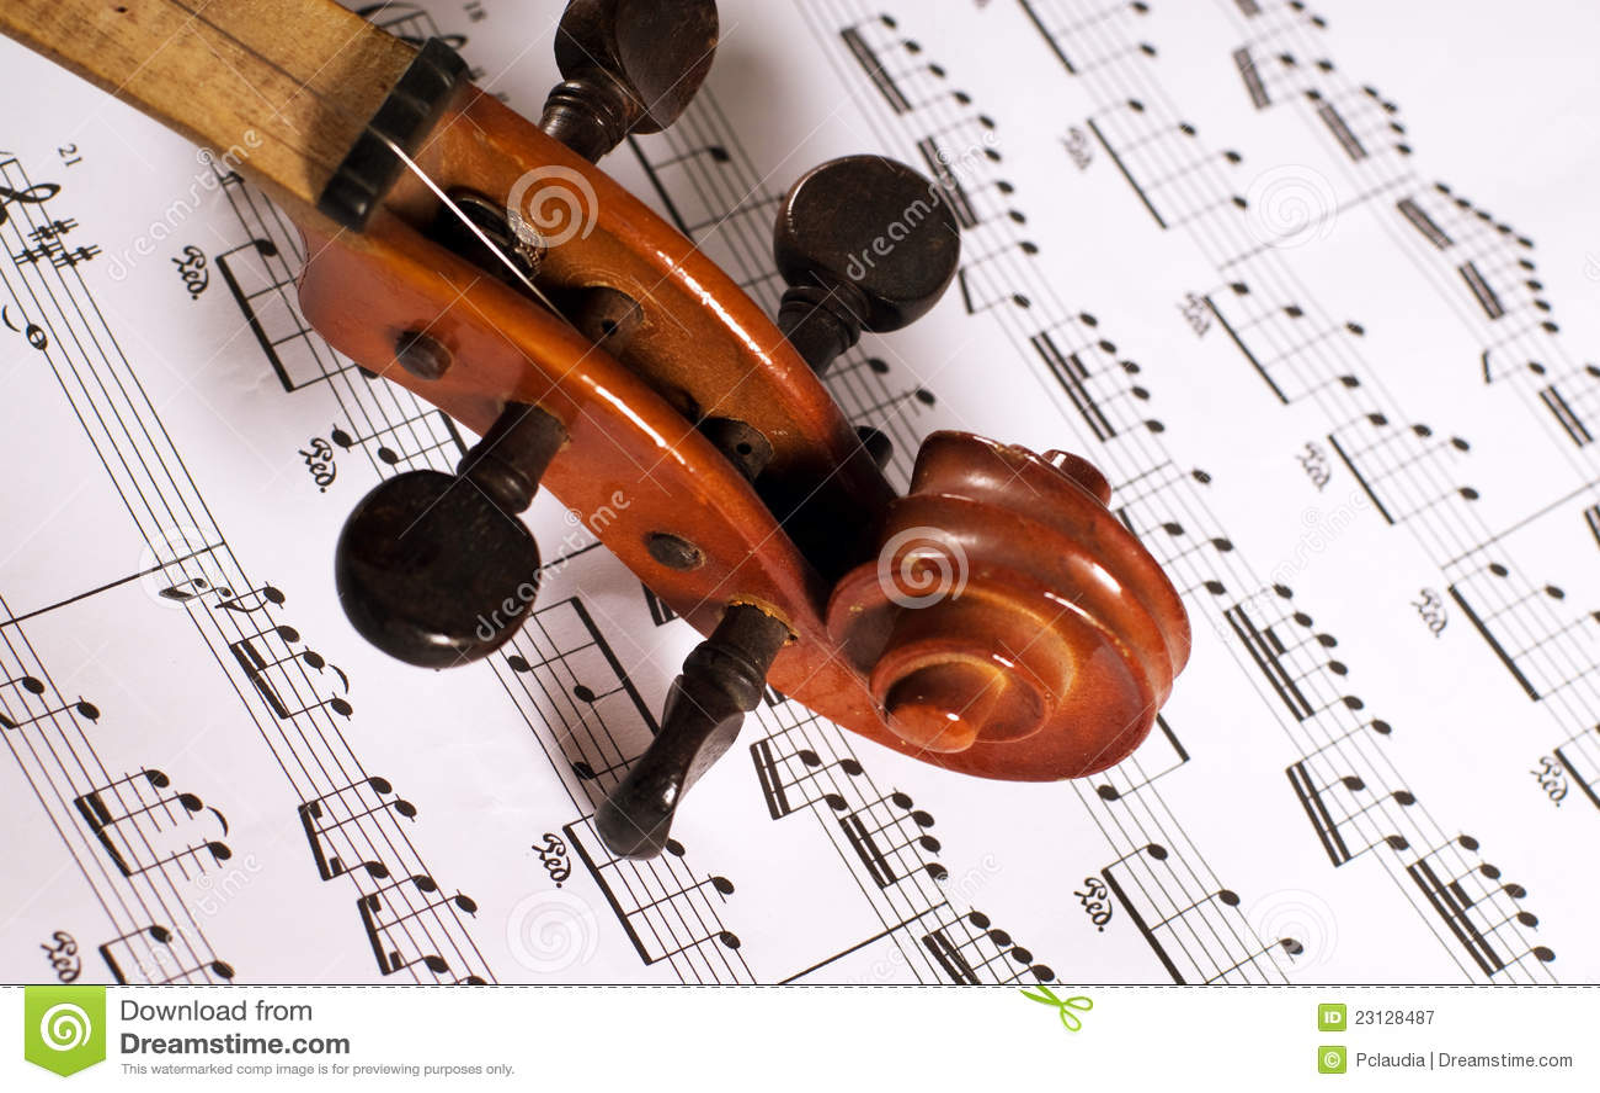 Violin And Tab Royalty Free Stock Photography - Image: 23128487